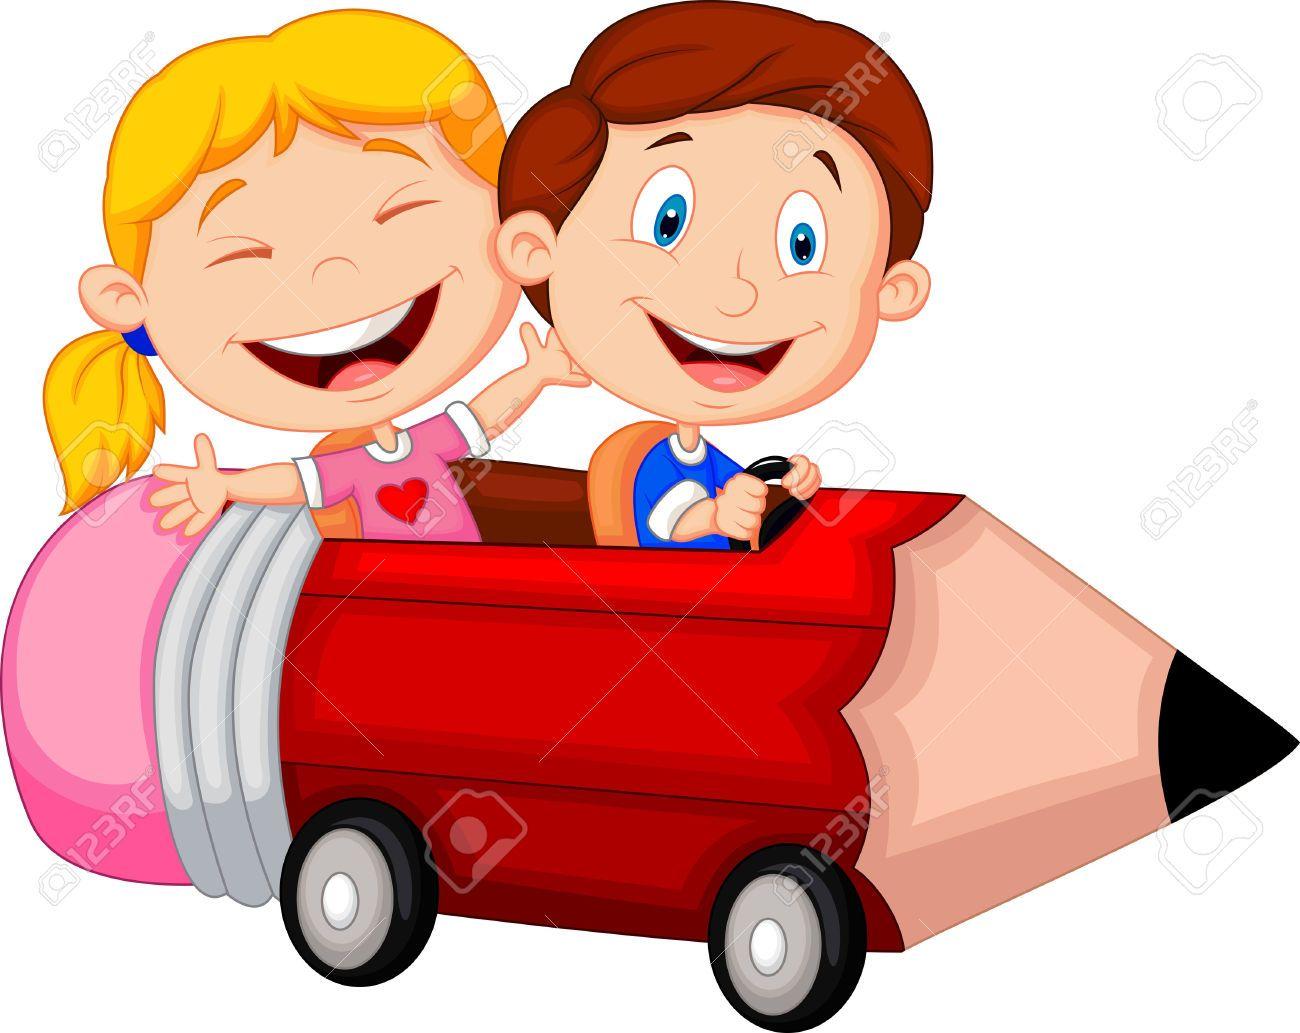 7 habvtis happy kids pdf